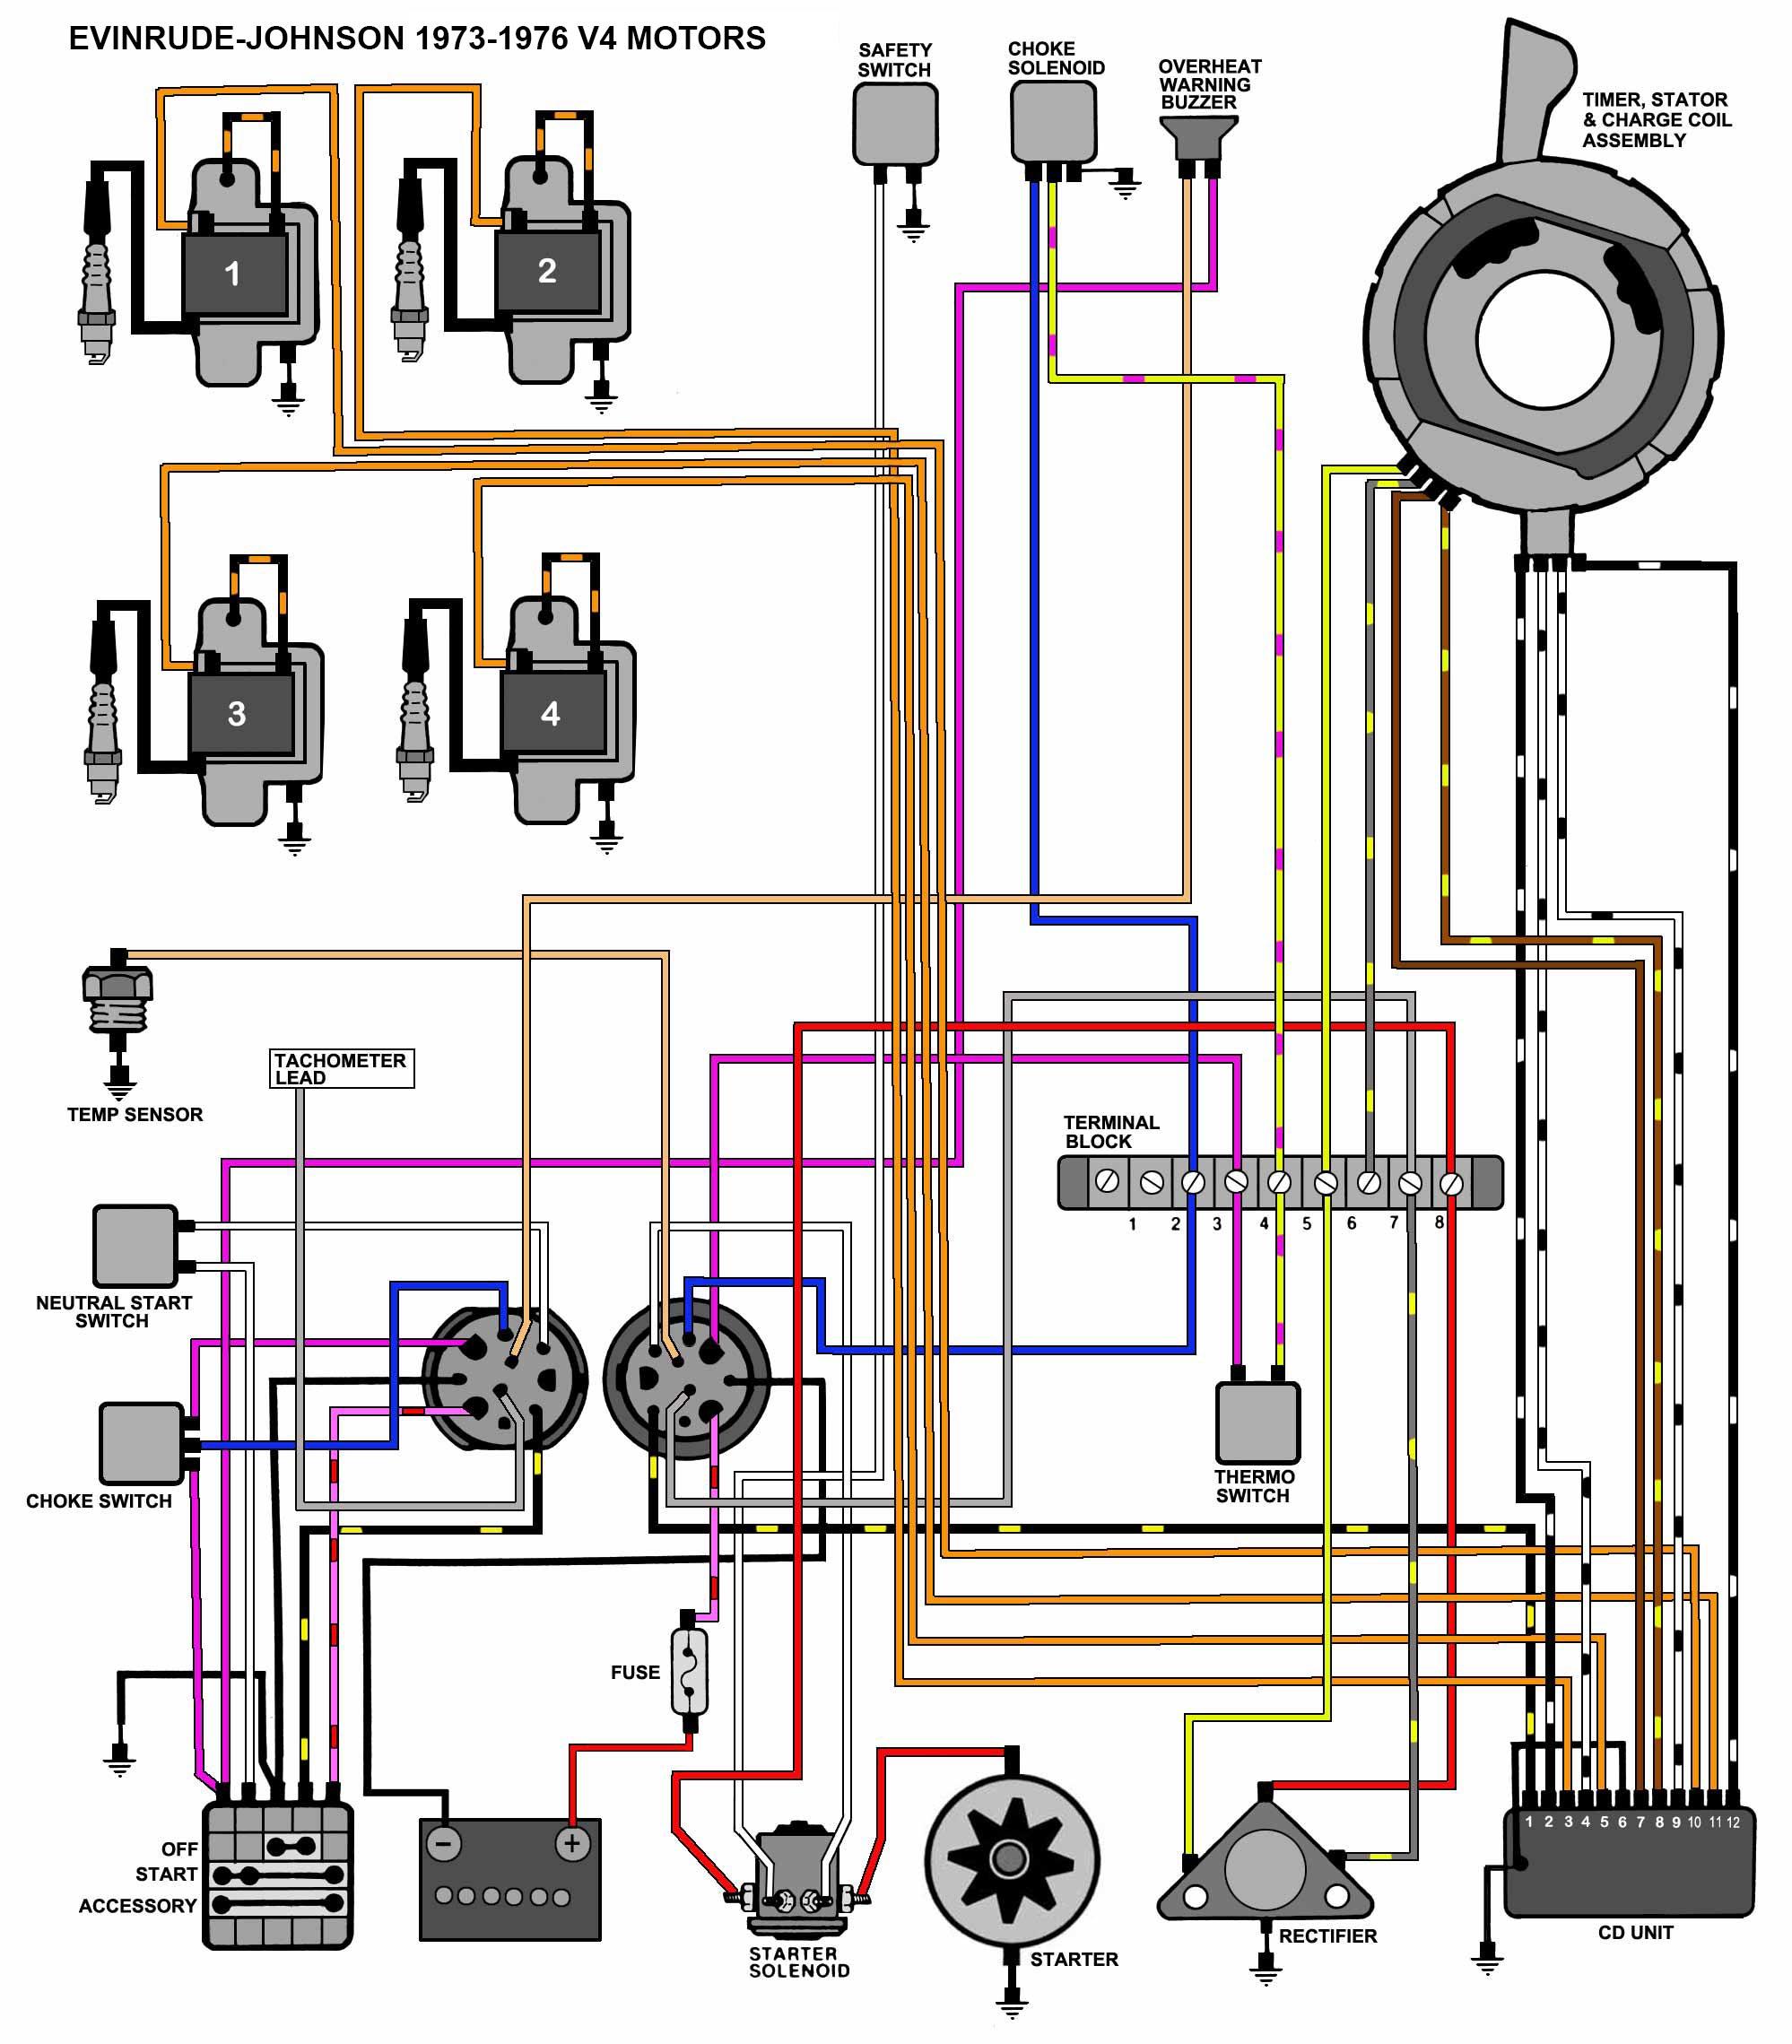 120 hp evinrude wiring diagram wiring diagram third level25 hp evinrude wiring diagram wiring diagram todays evinrude schematics 120 hp evinrude wiring diagram